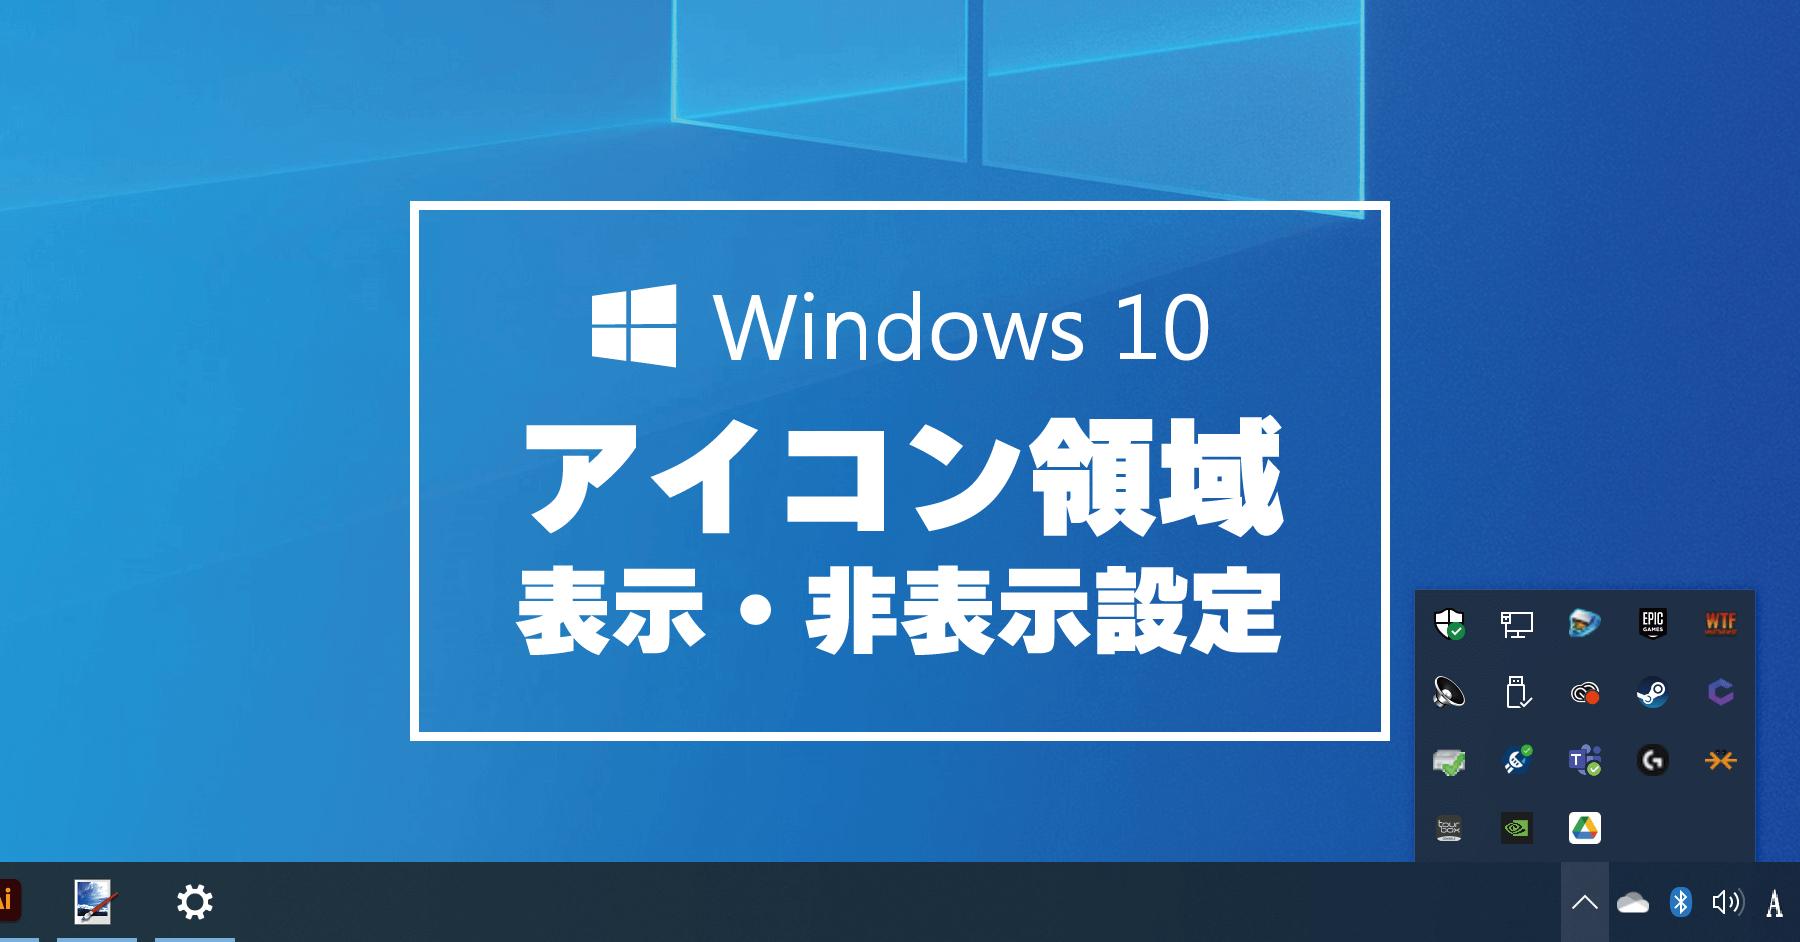 Windows 10 アイコン領域 表示・非表示設定